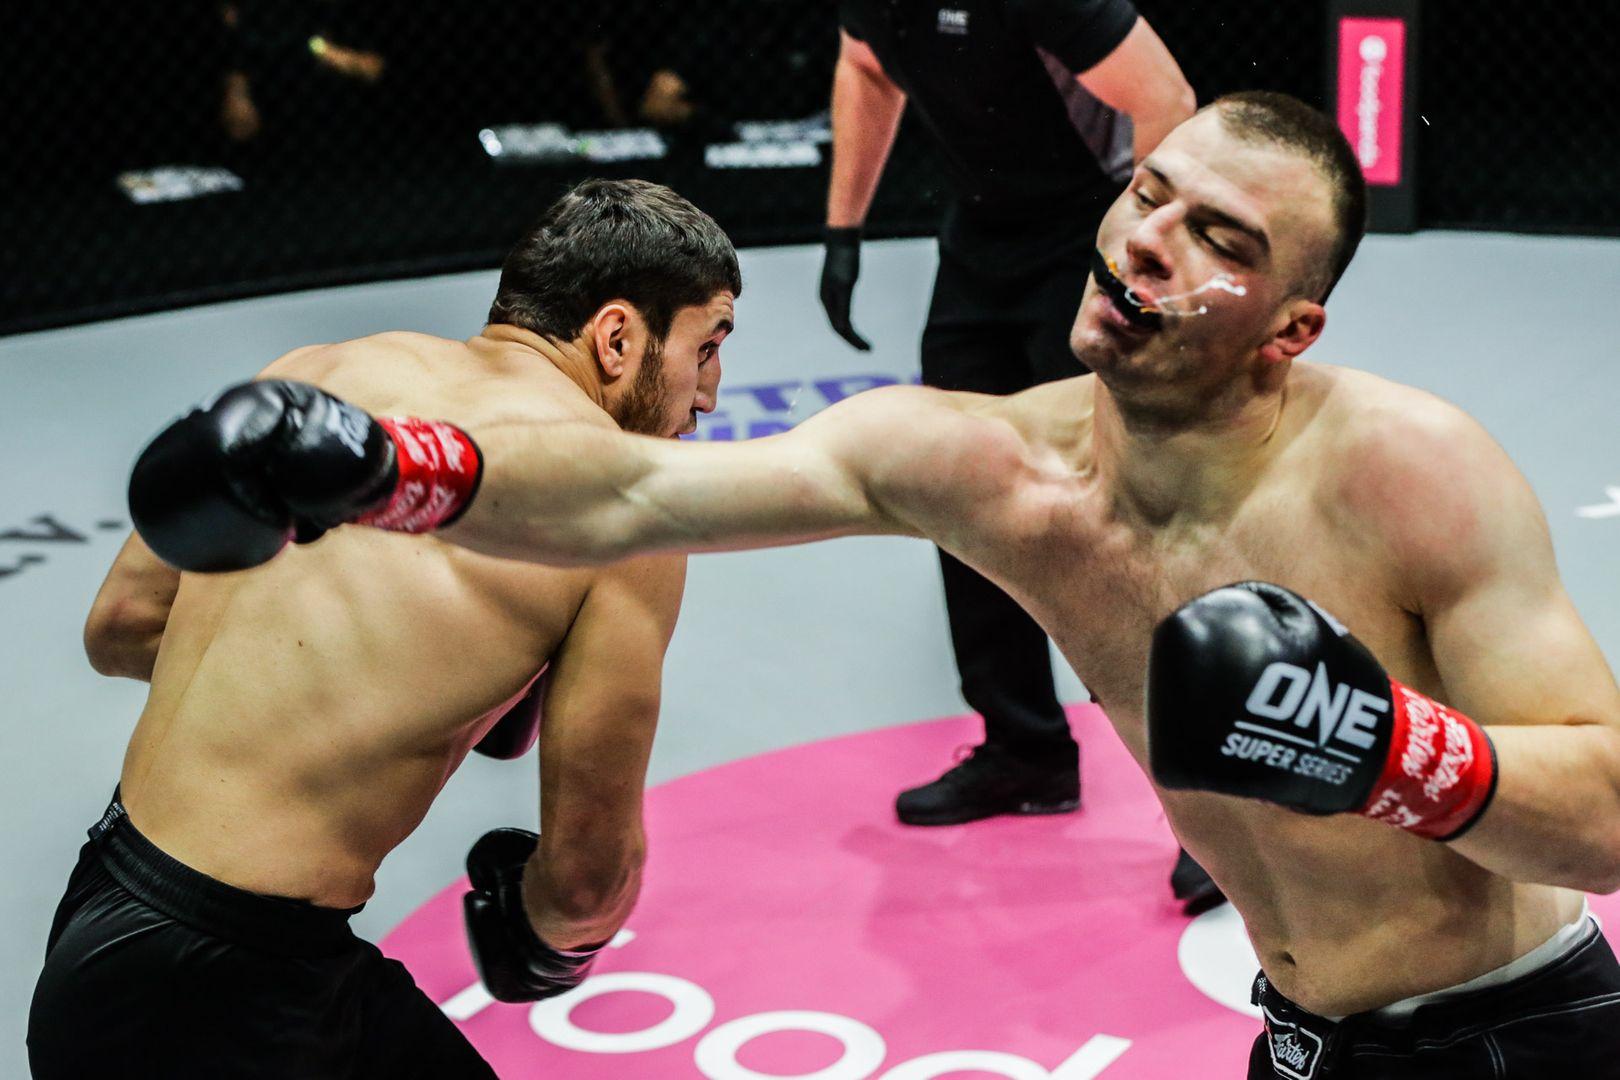 Light heavyweight kickboxers Mihajlo Kecojevic and Beybulat Isaev fight at ONE: UNBREAKABLE II in January 2021